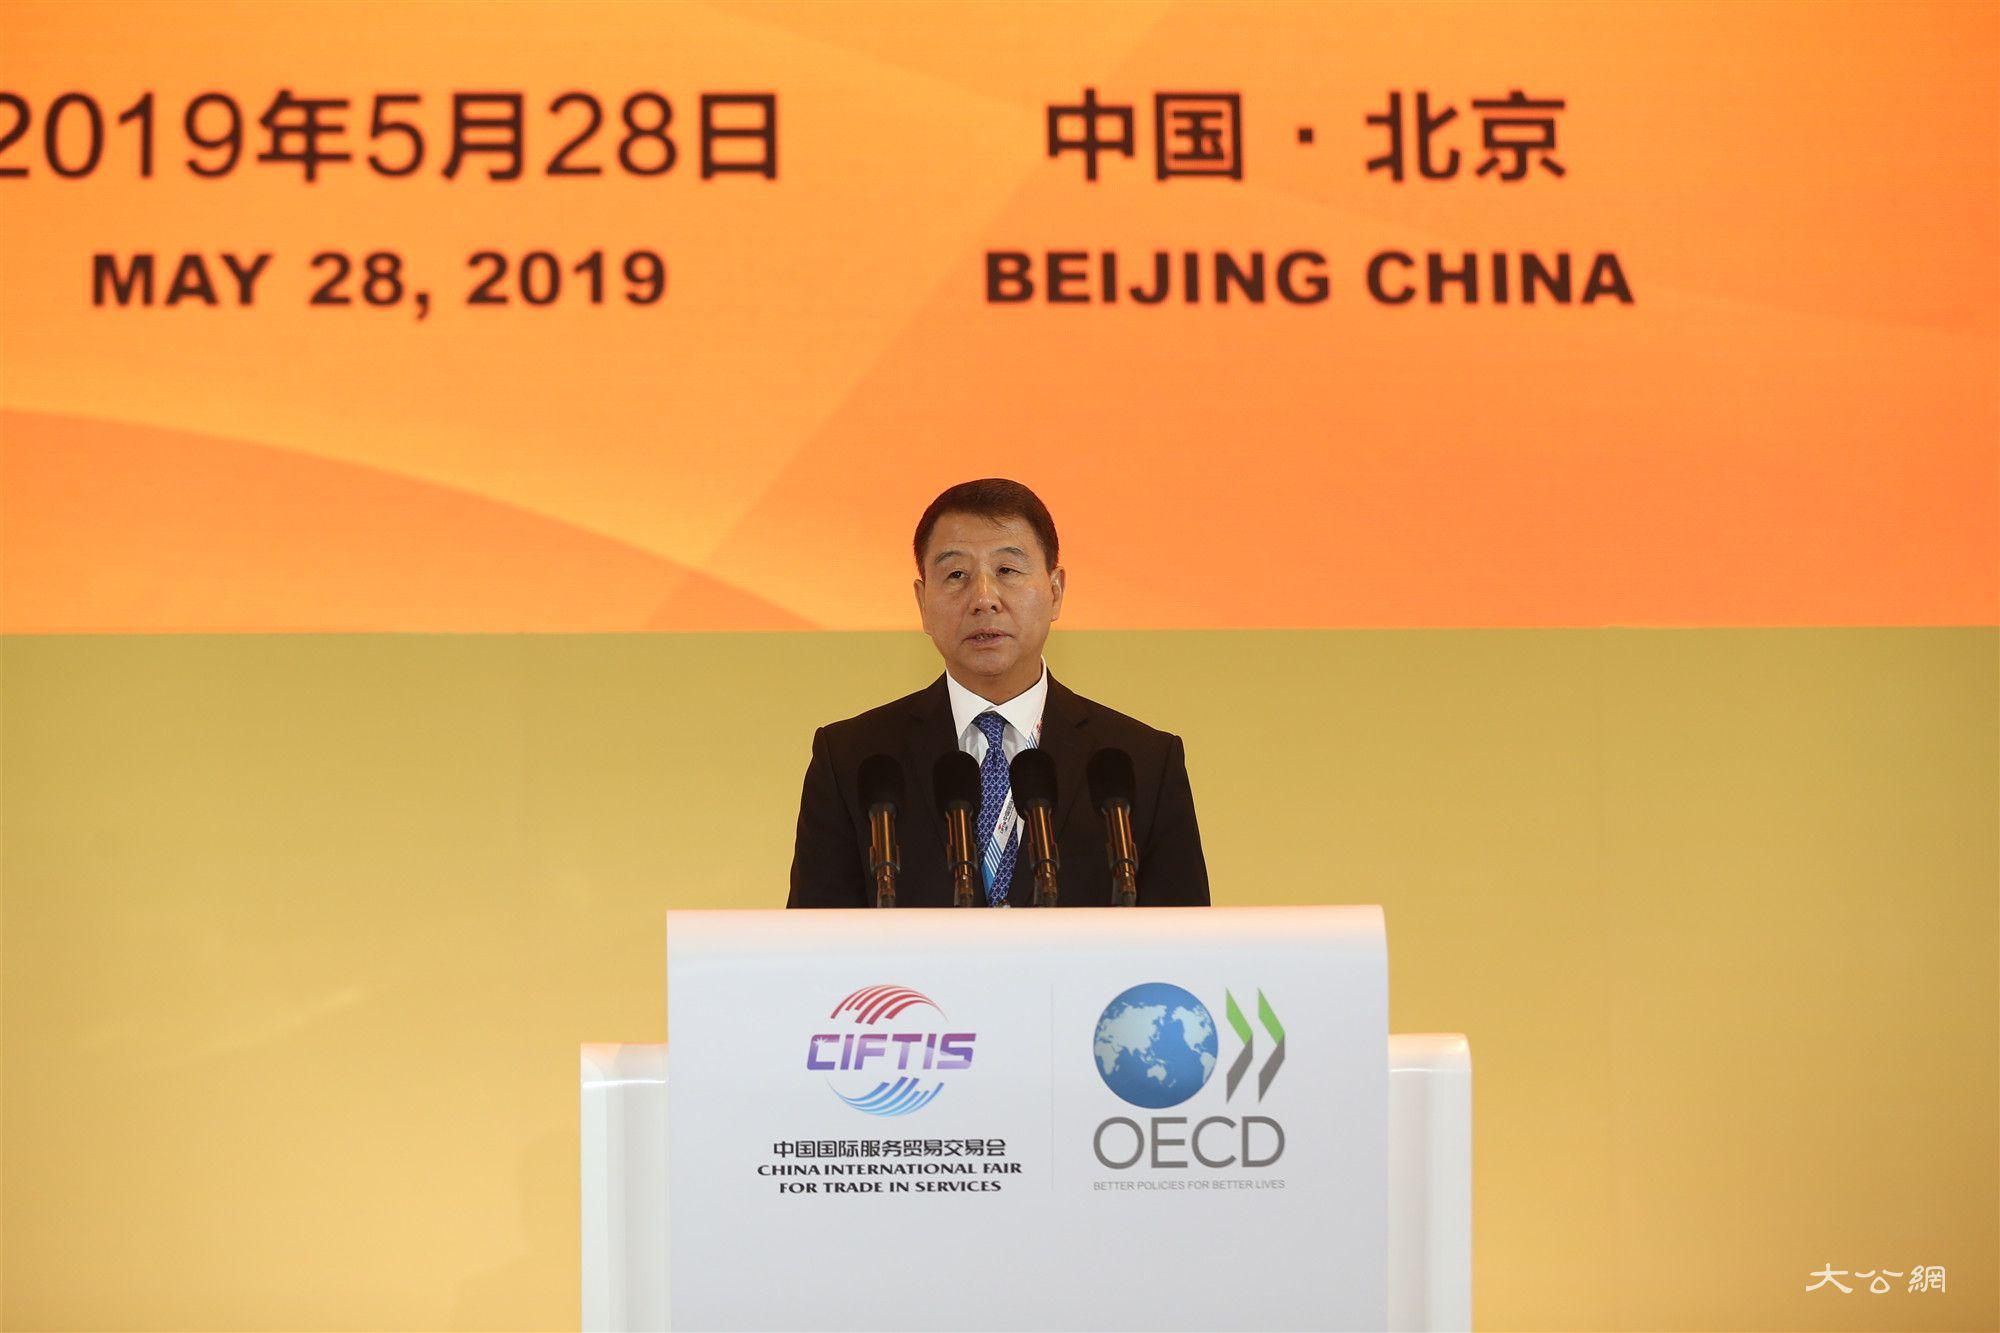 WTO副总干事易小准:多边贸易体制和规则是对中国未来发展最好的保护